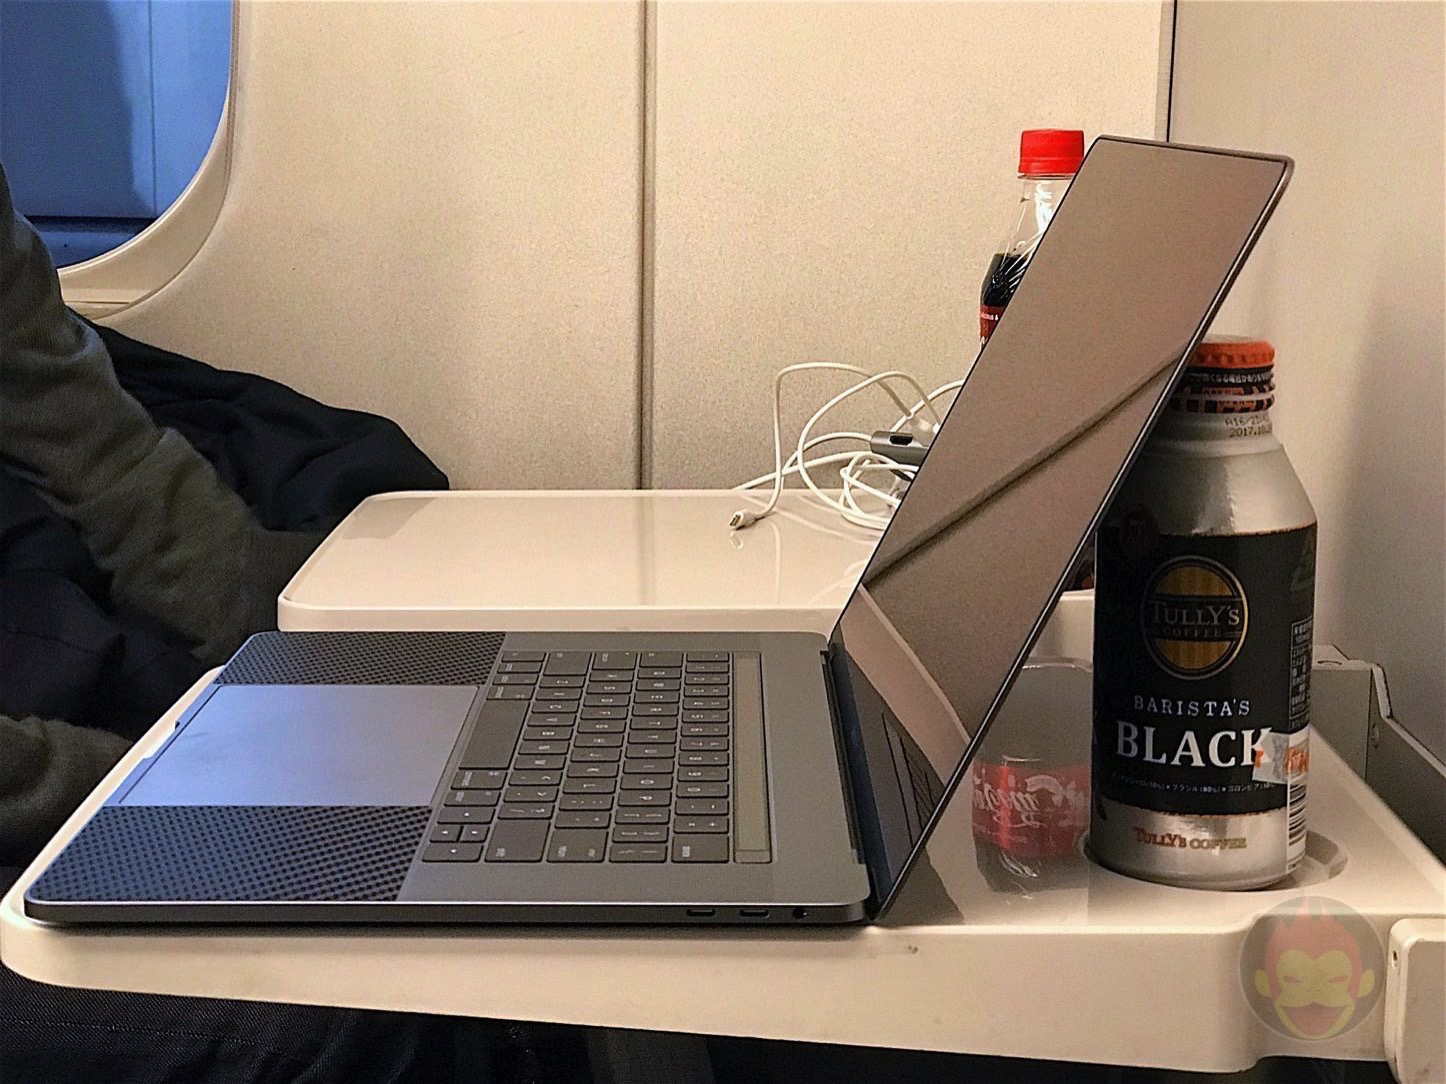 MacBookProLate2016を新幹線の机で使う